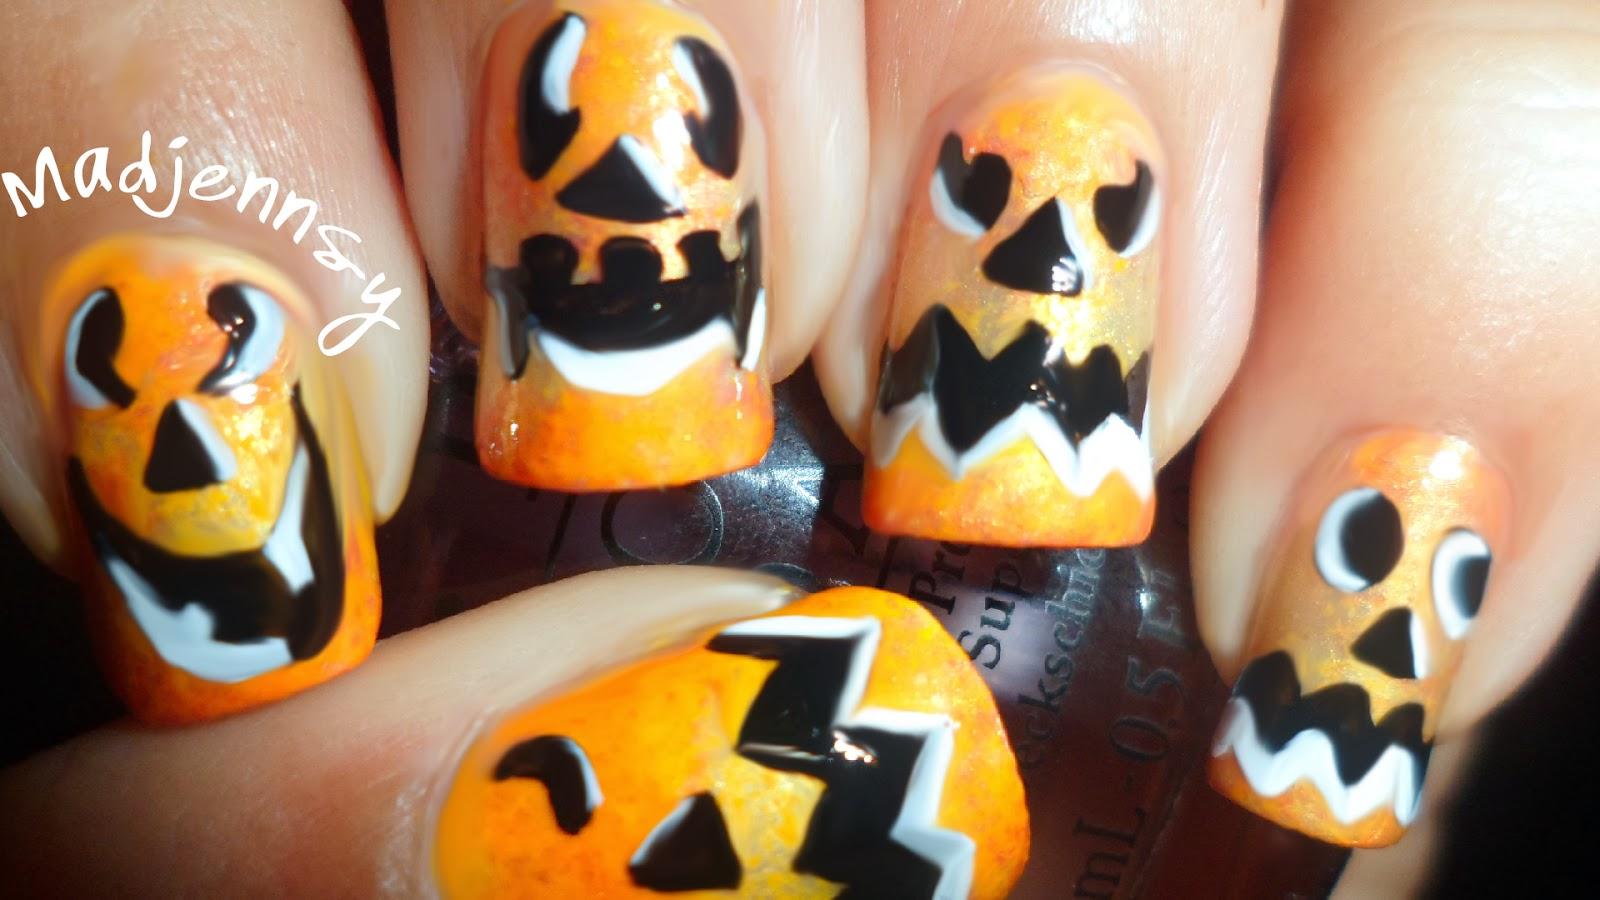 DIY Pumpkin Face ~ Halloween Nail Art Tutorial | Madjennsy Nail Art!